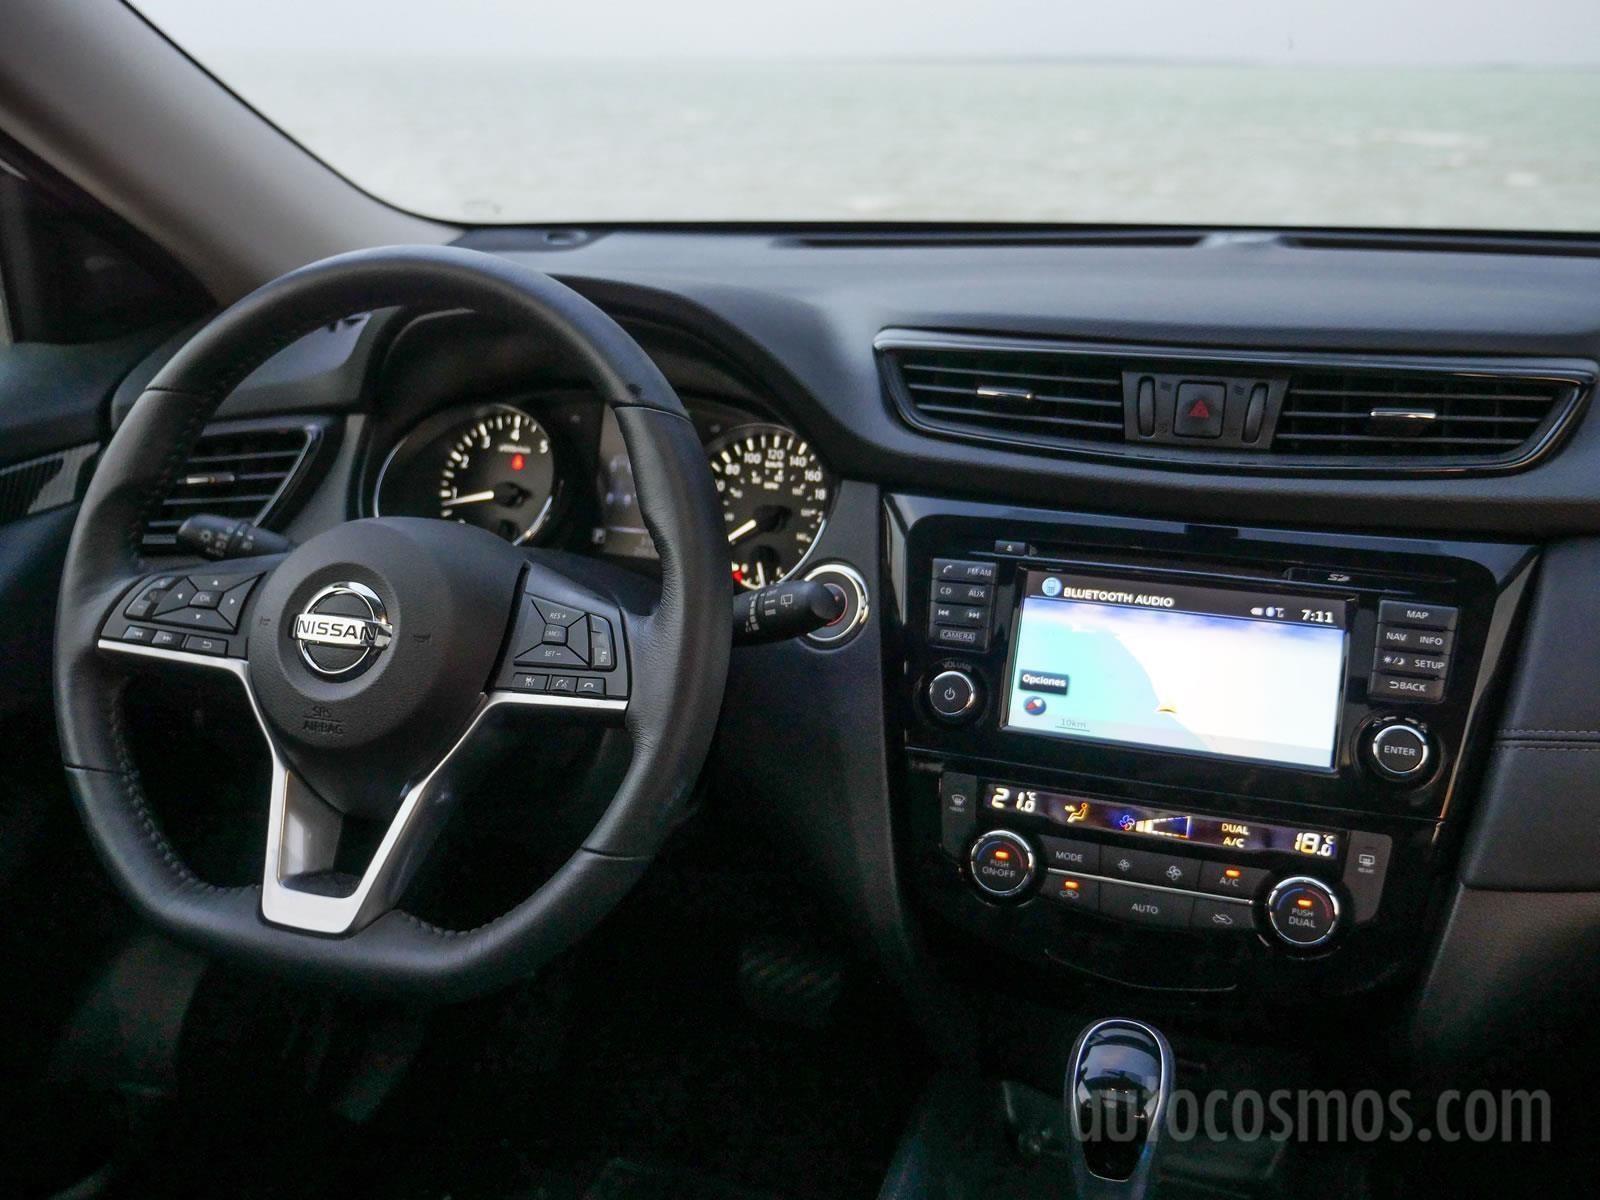 2003 Nissan Altima Fuse Box Diagram Car Interior Design